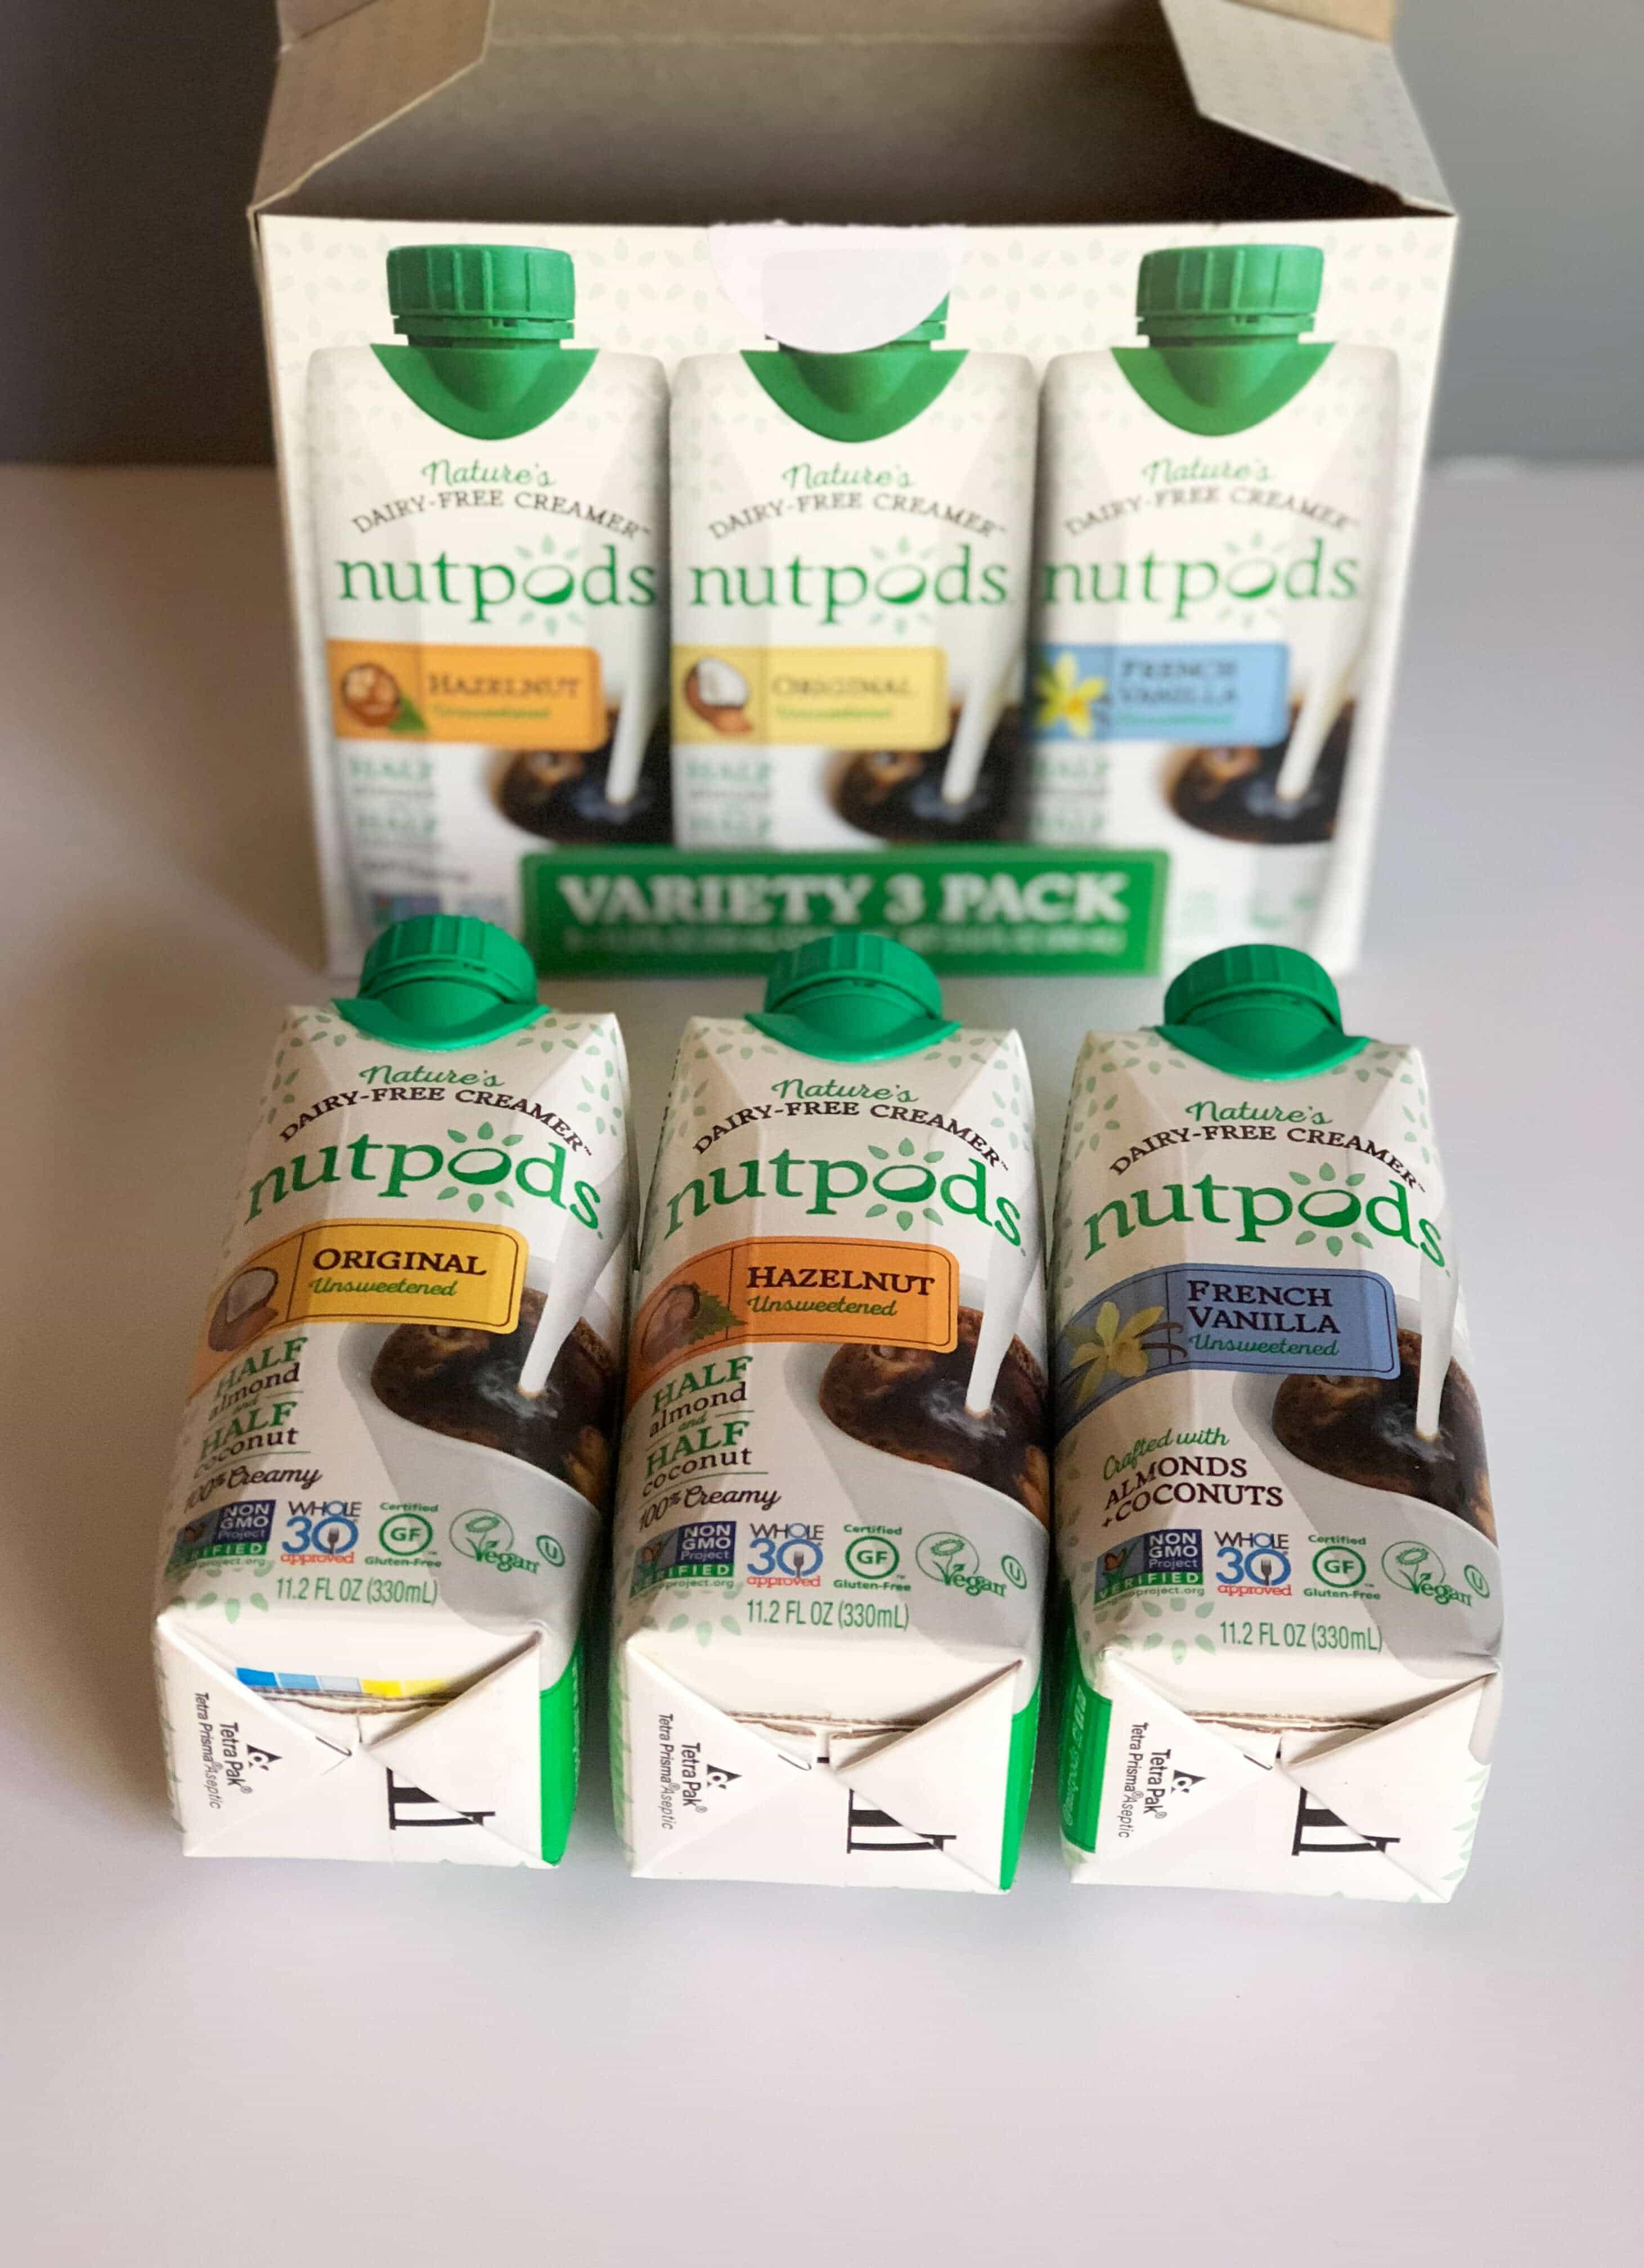 Nutpods - The Non-Dairy Creamer Alternative #saveeandsavory #review #nutpods #dairyfree #vegan #whole30 #kickstarter